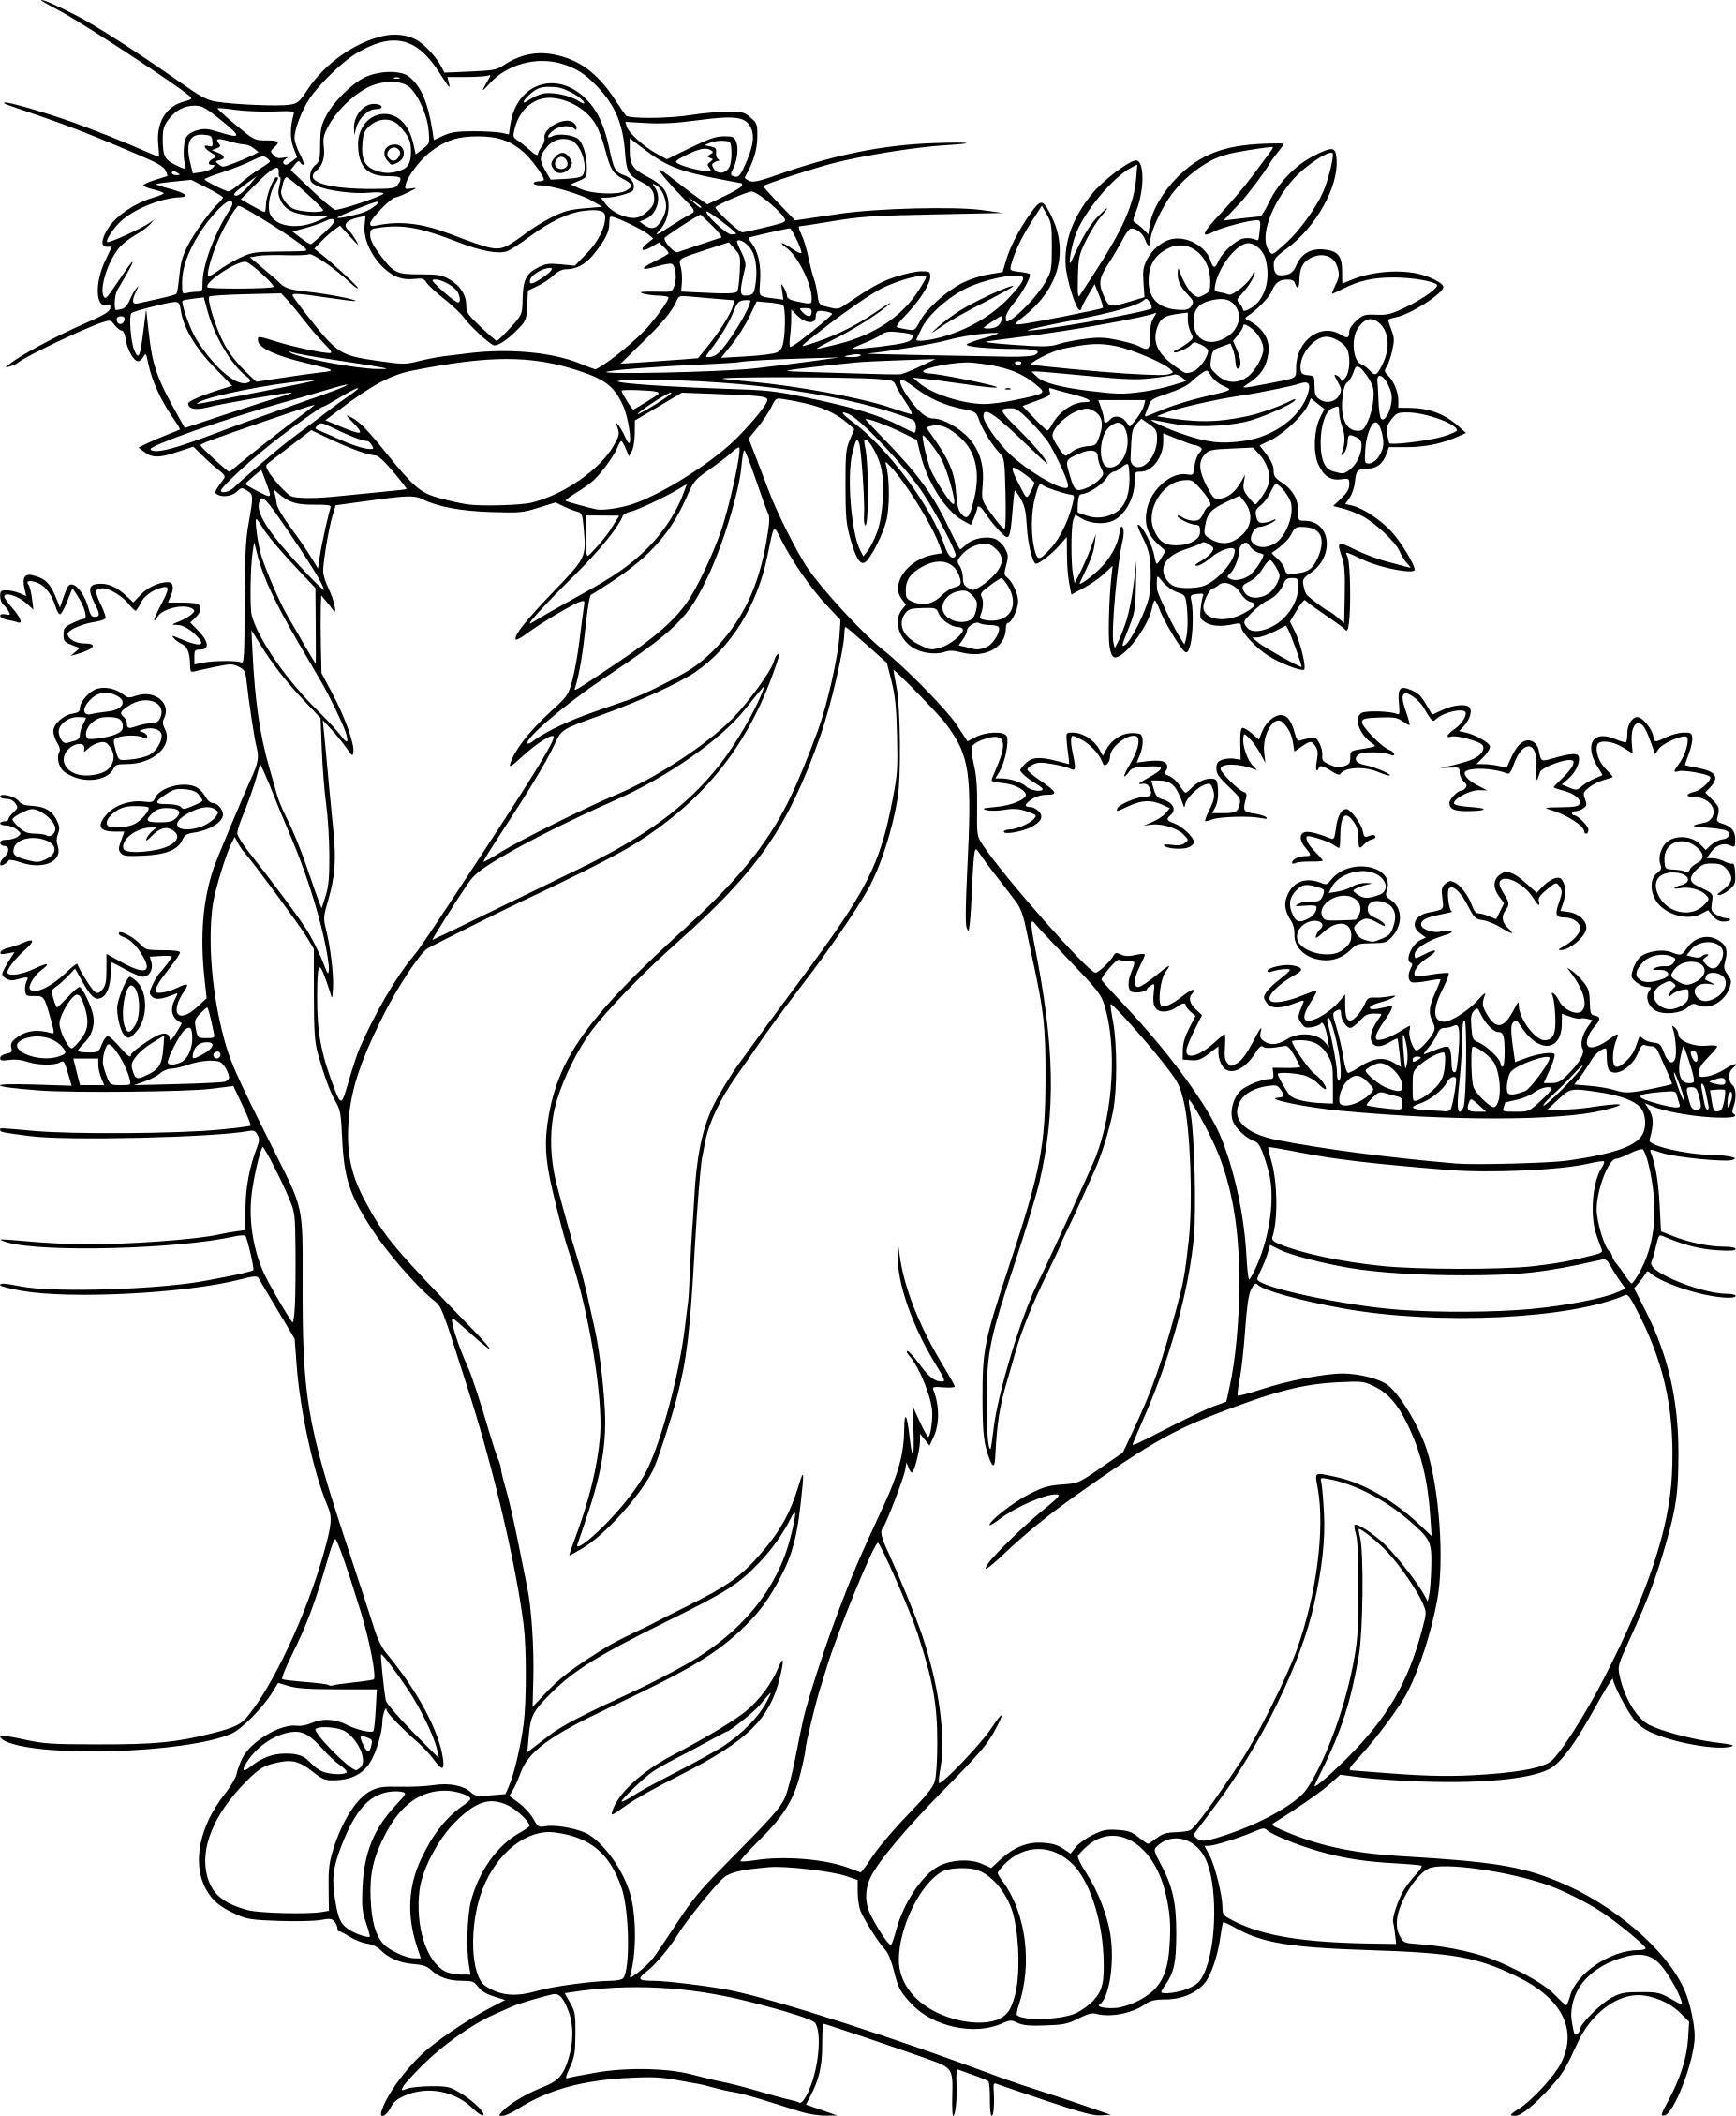 Coloriage Rajah Aladdin